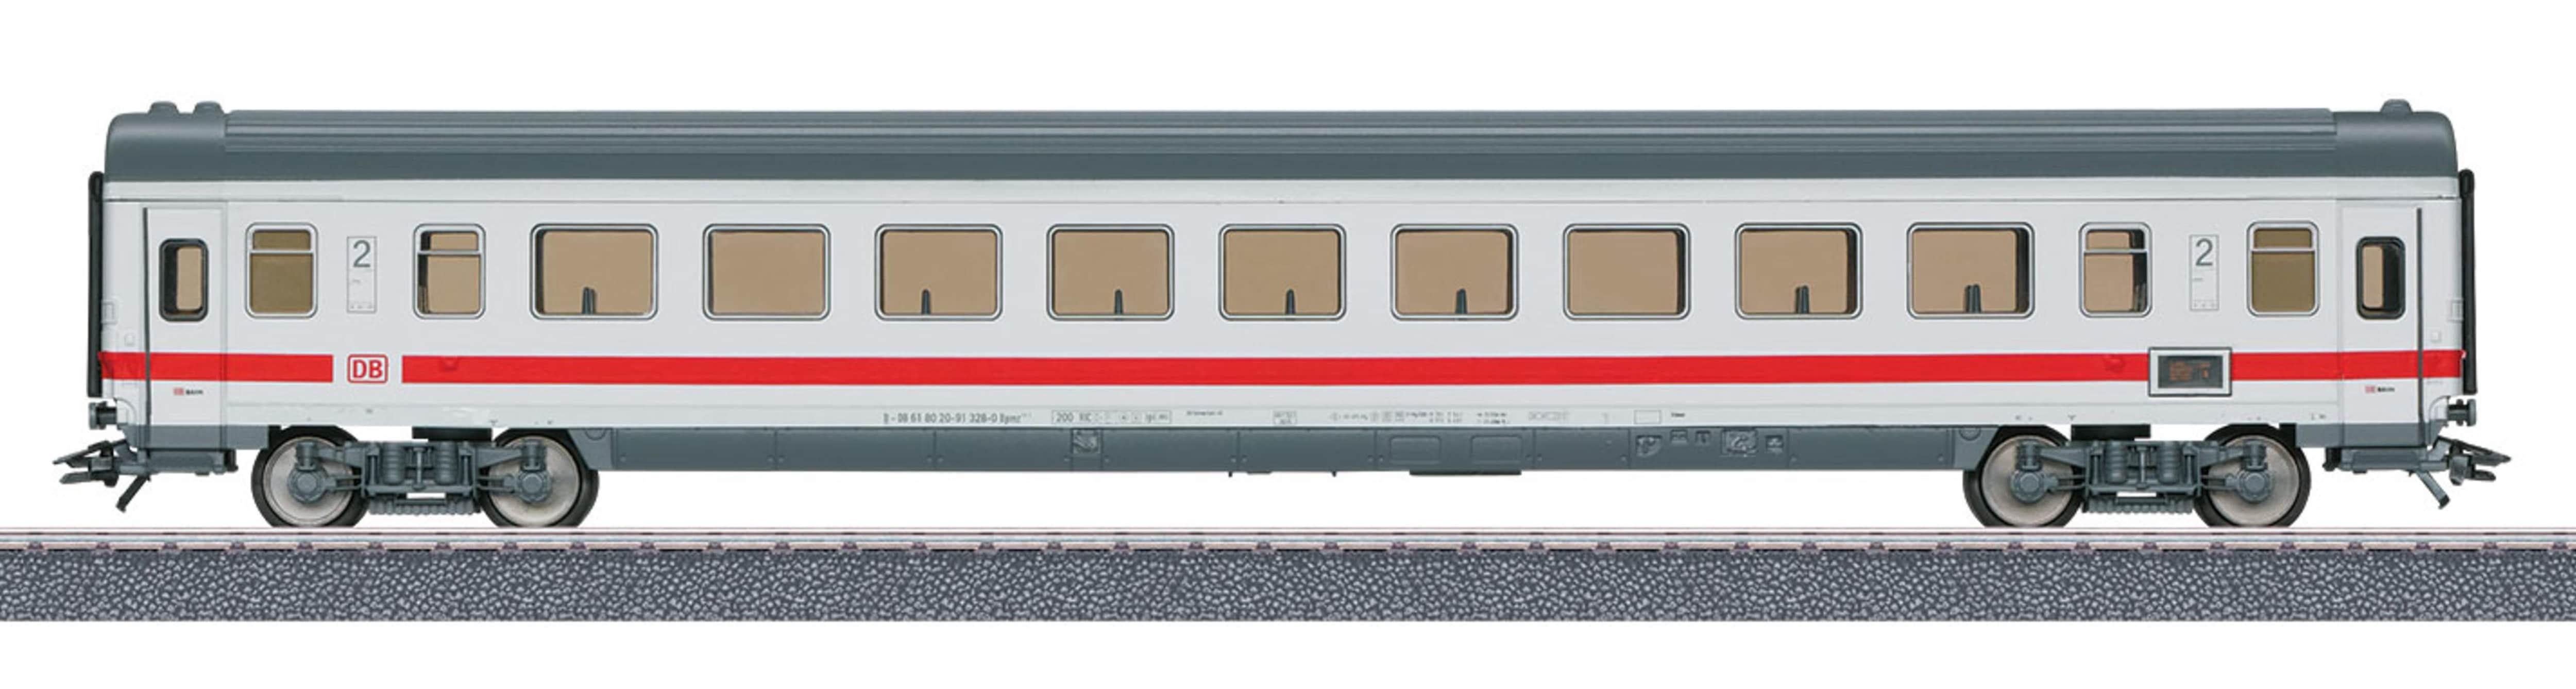 Märklin Personenwagen IC Schnellzugwagen 2. Klasse DB AG - 40501, Spur H0